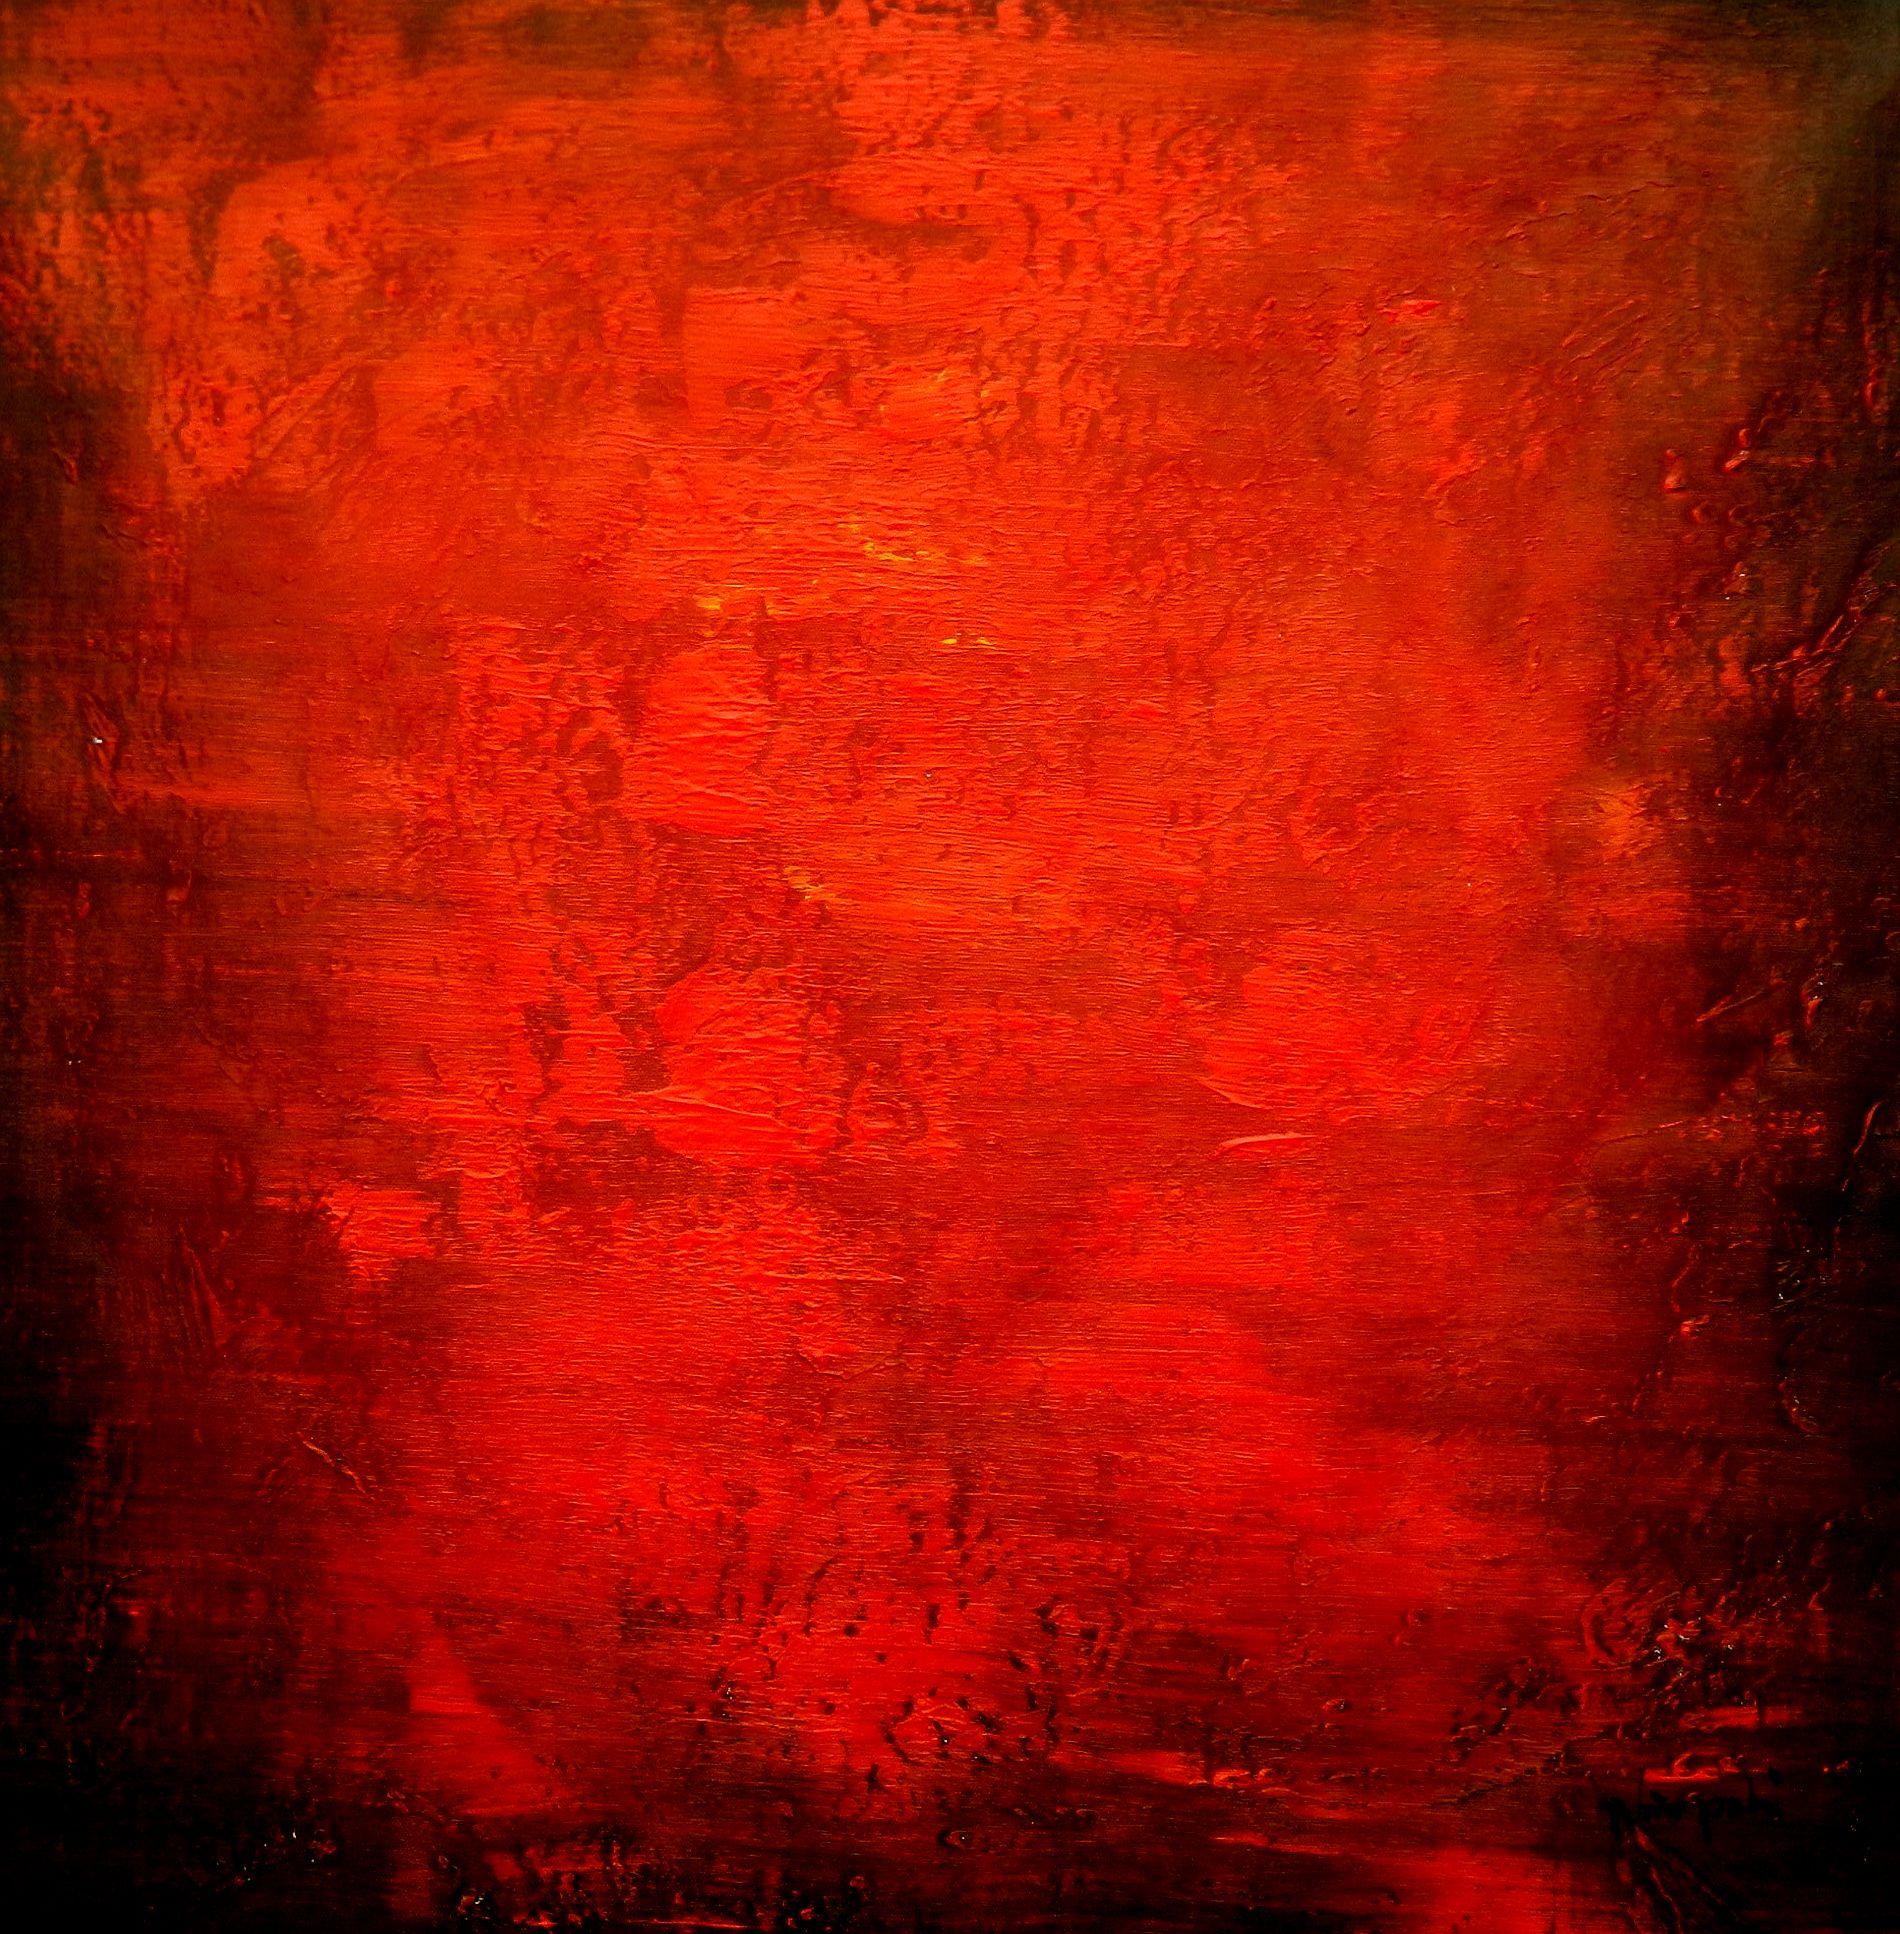 Abstrakt - Black Ruby e94623 60x60cm abstraktes Ölgemälde handgemalt